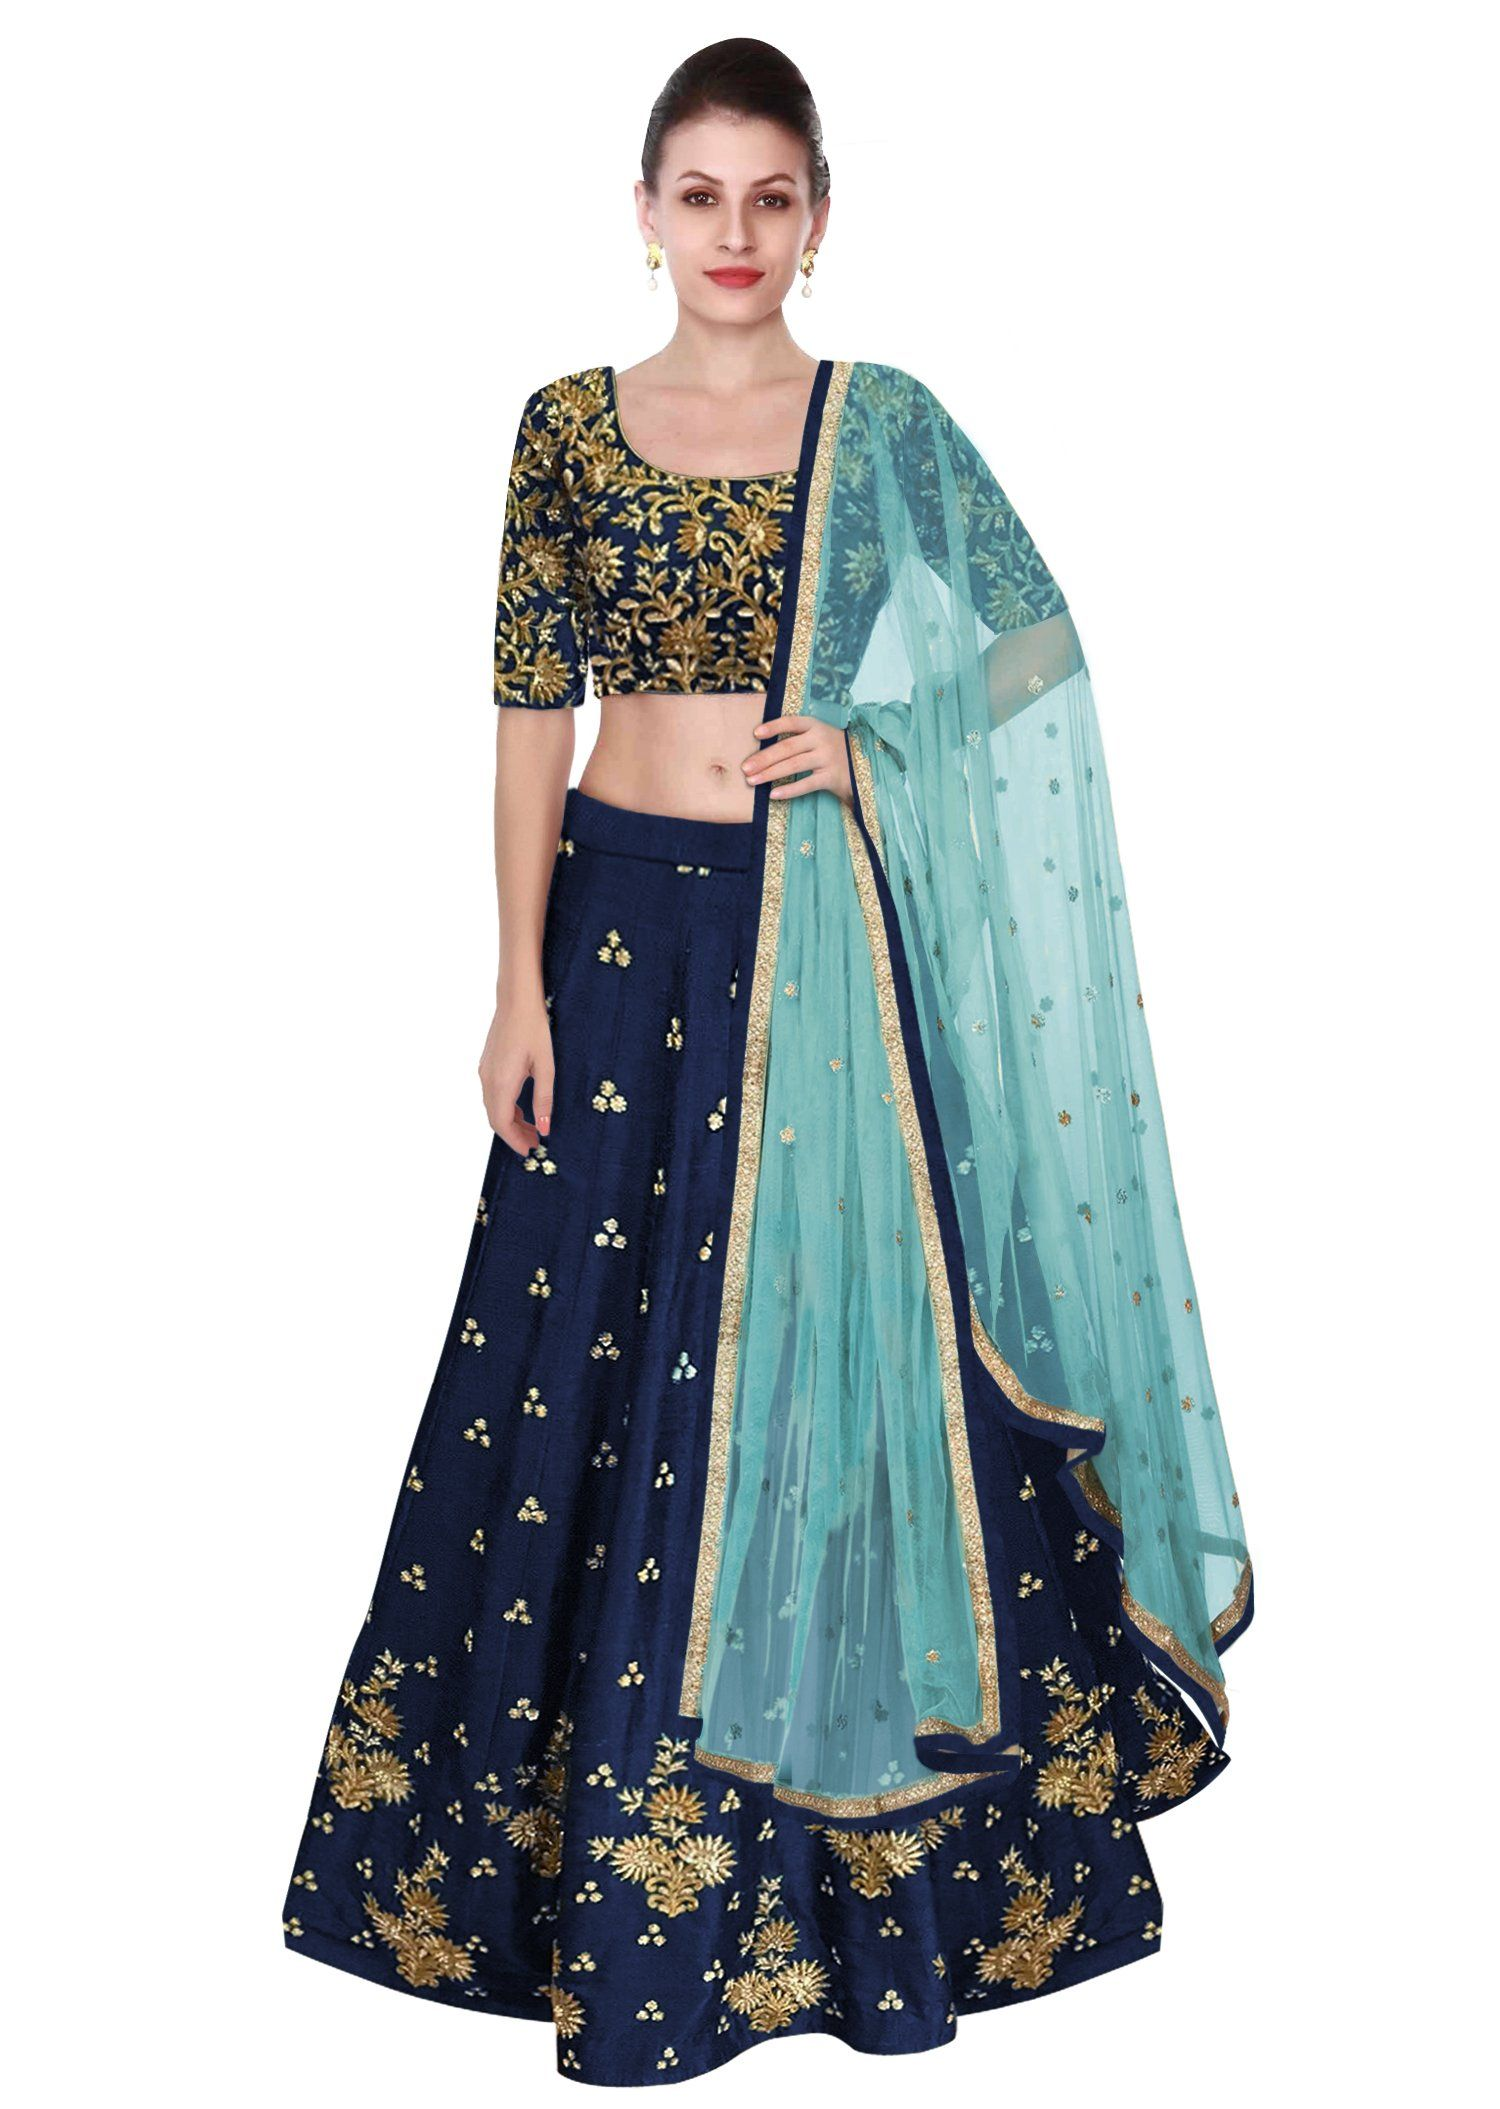 0439b4aa69 Look beautiful in the navi blue #LehengaCholi featured in raw silk with  Zari & gotta embroidery.